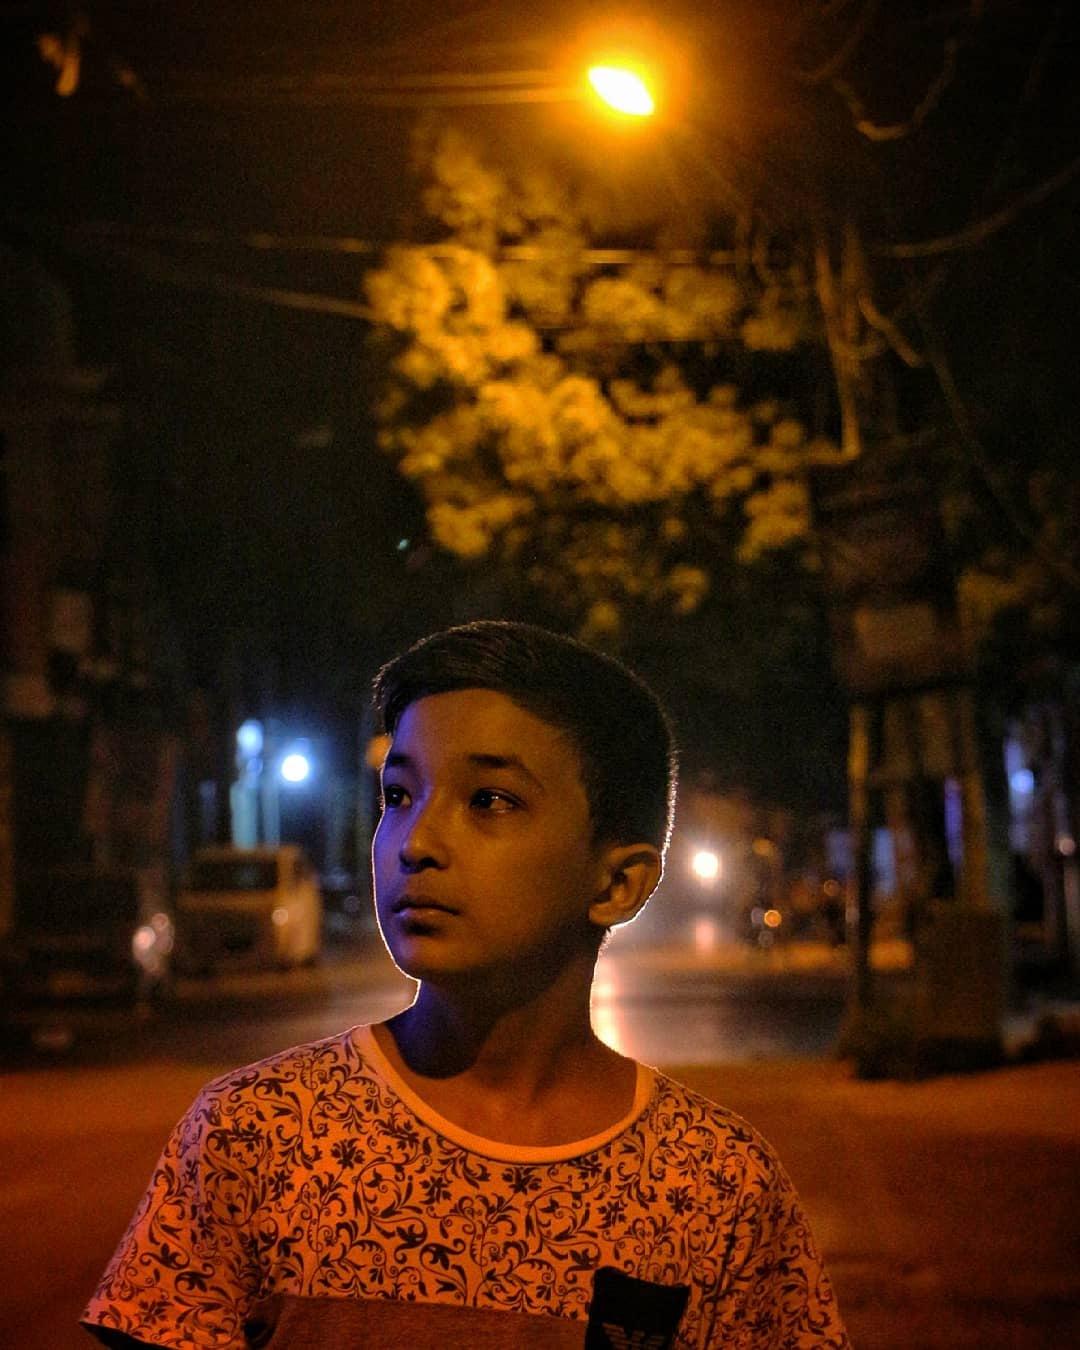 Street Vibes by Muhammad Mehdi